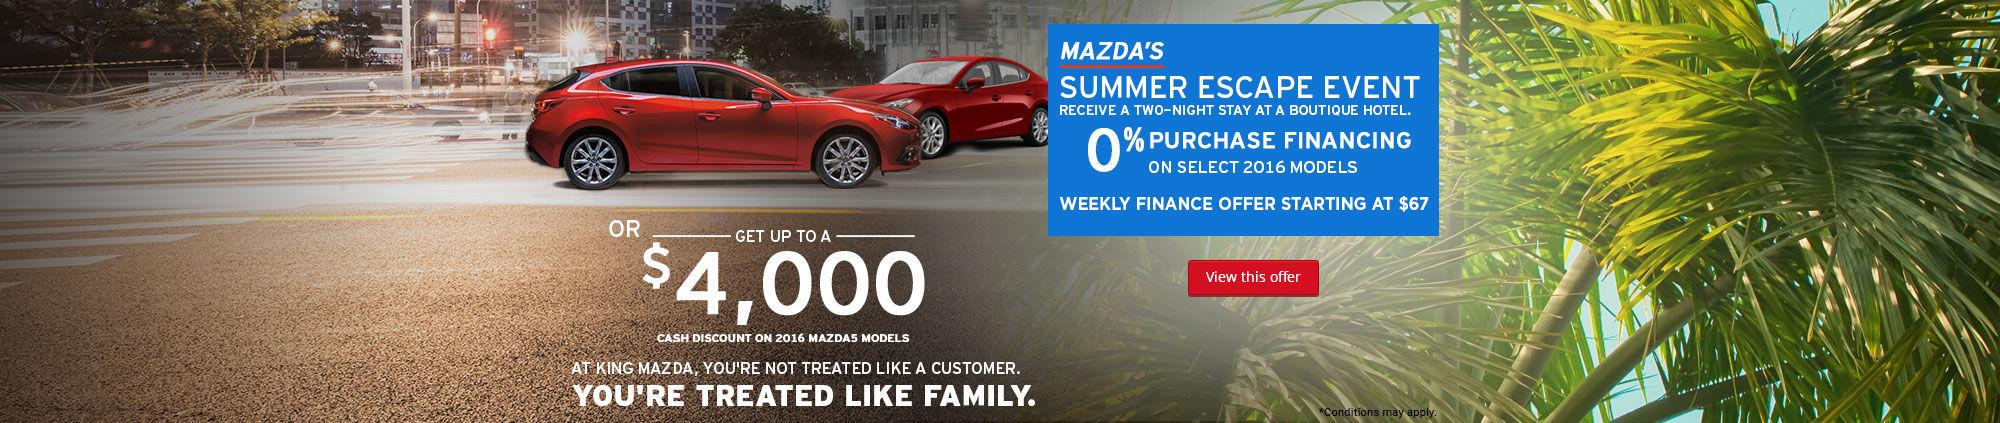 Mazda's Summer Escape Event-August